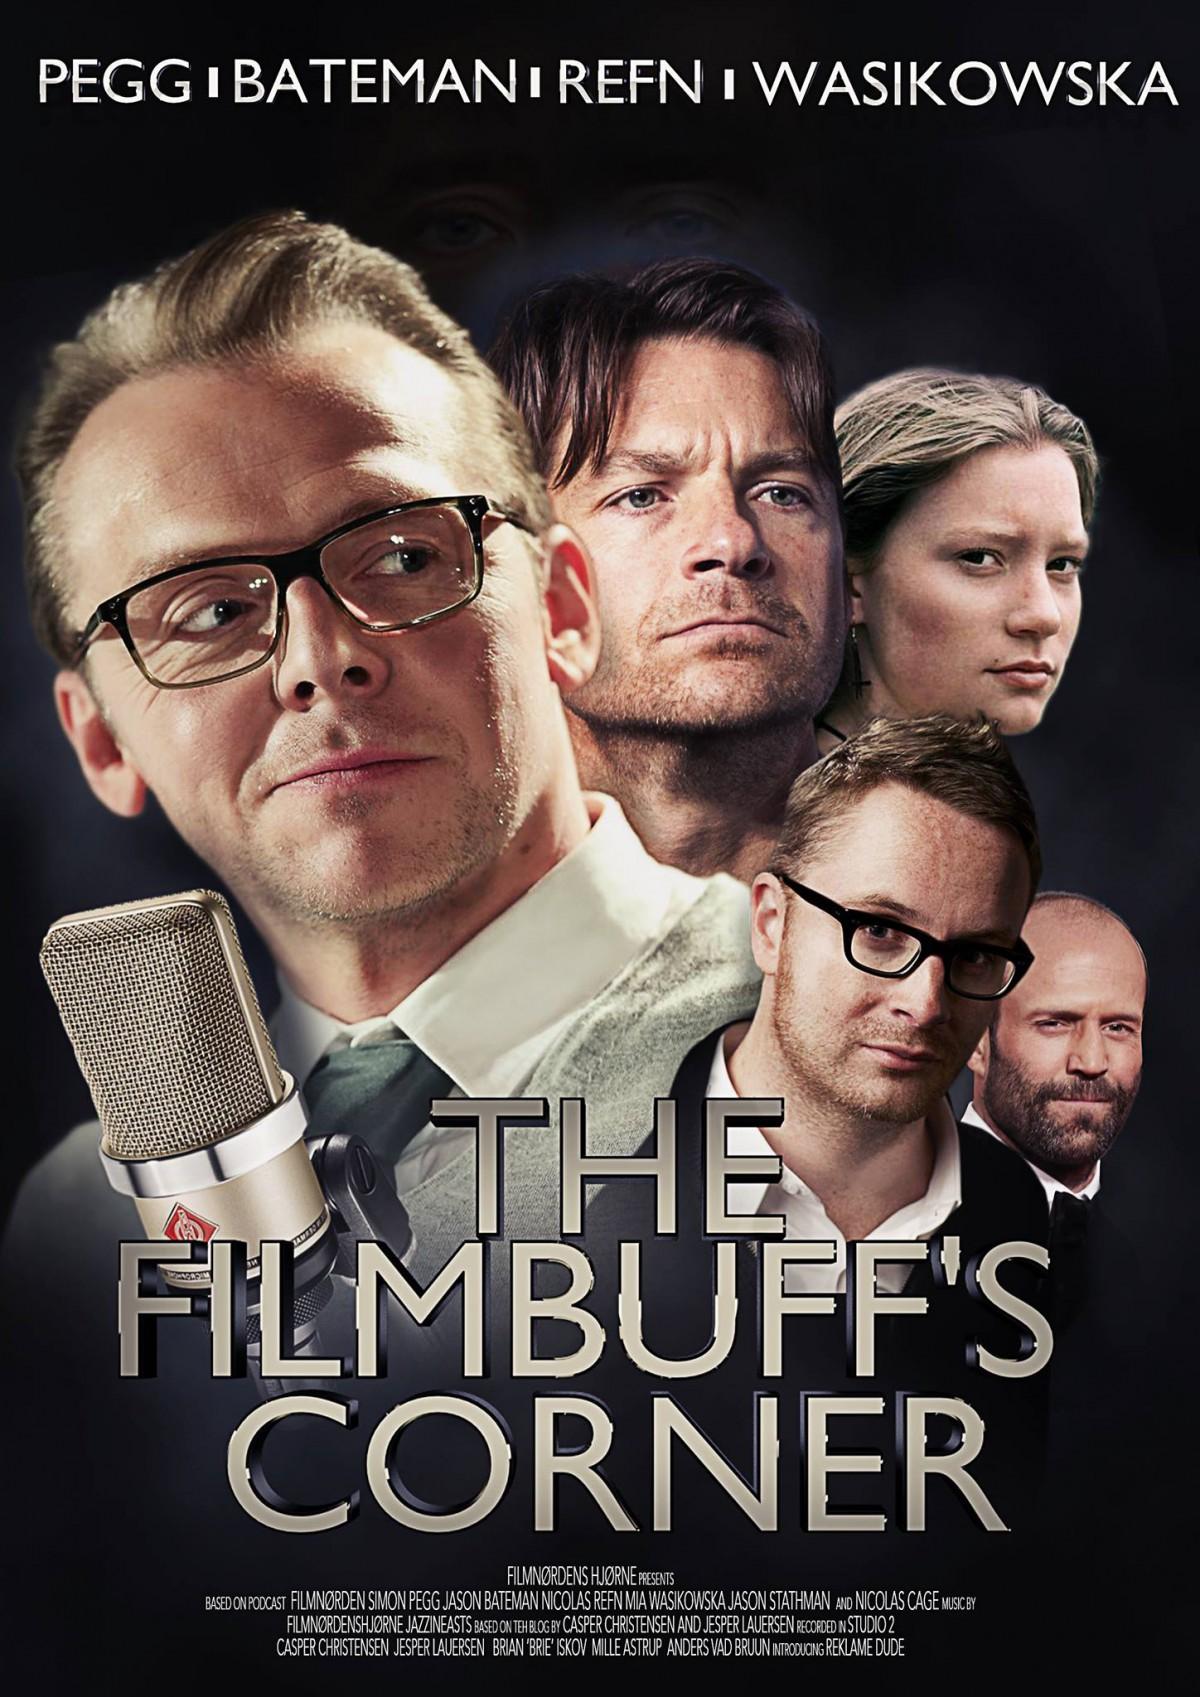 The Film Buff's Corner